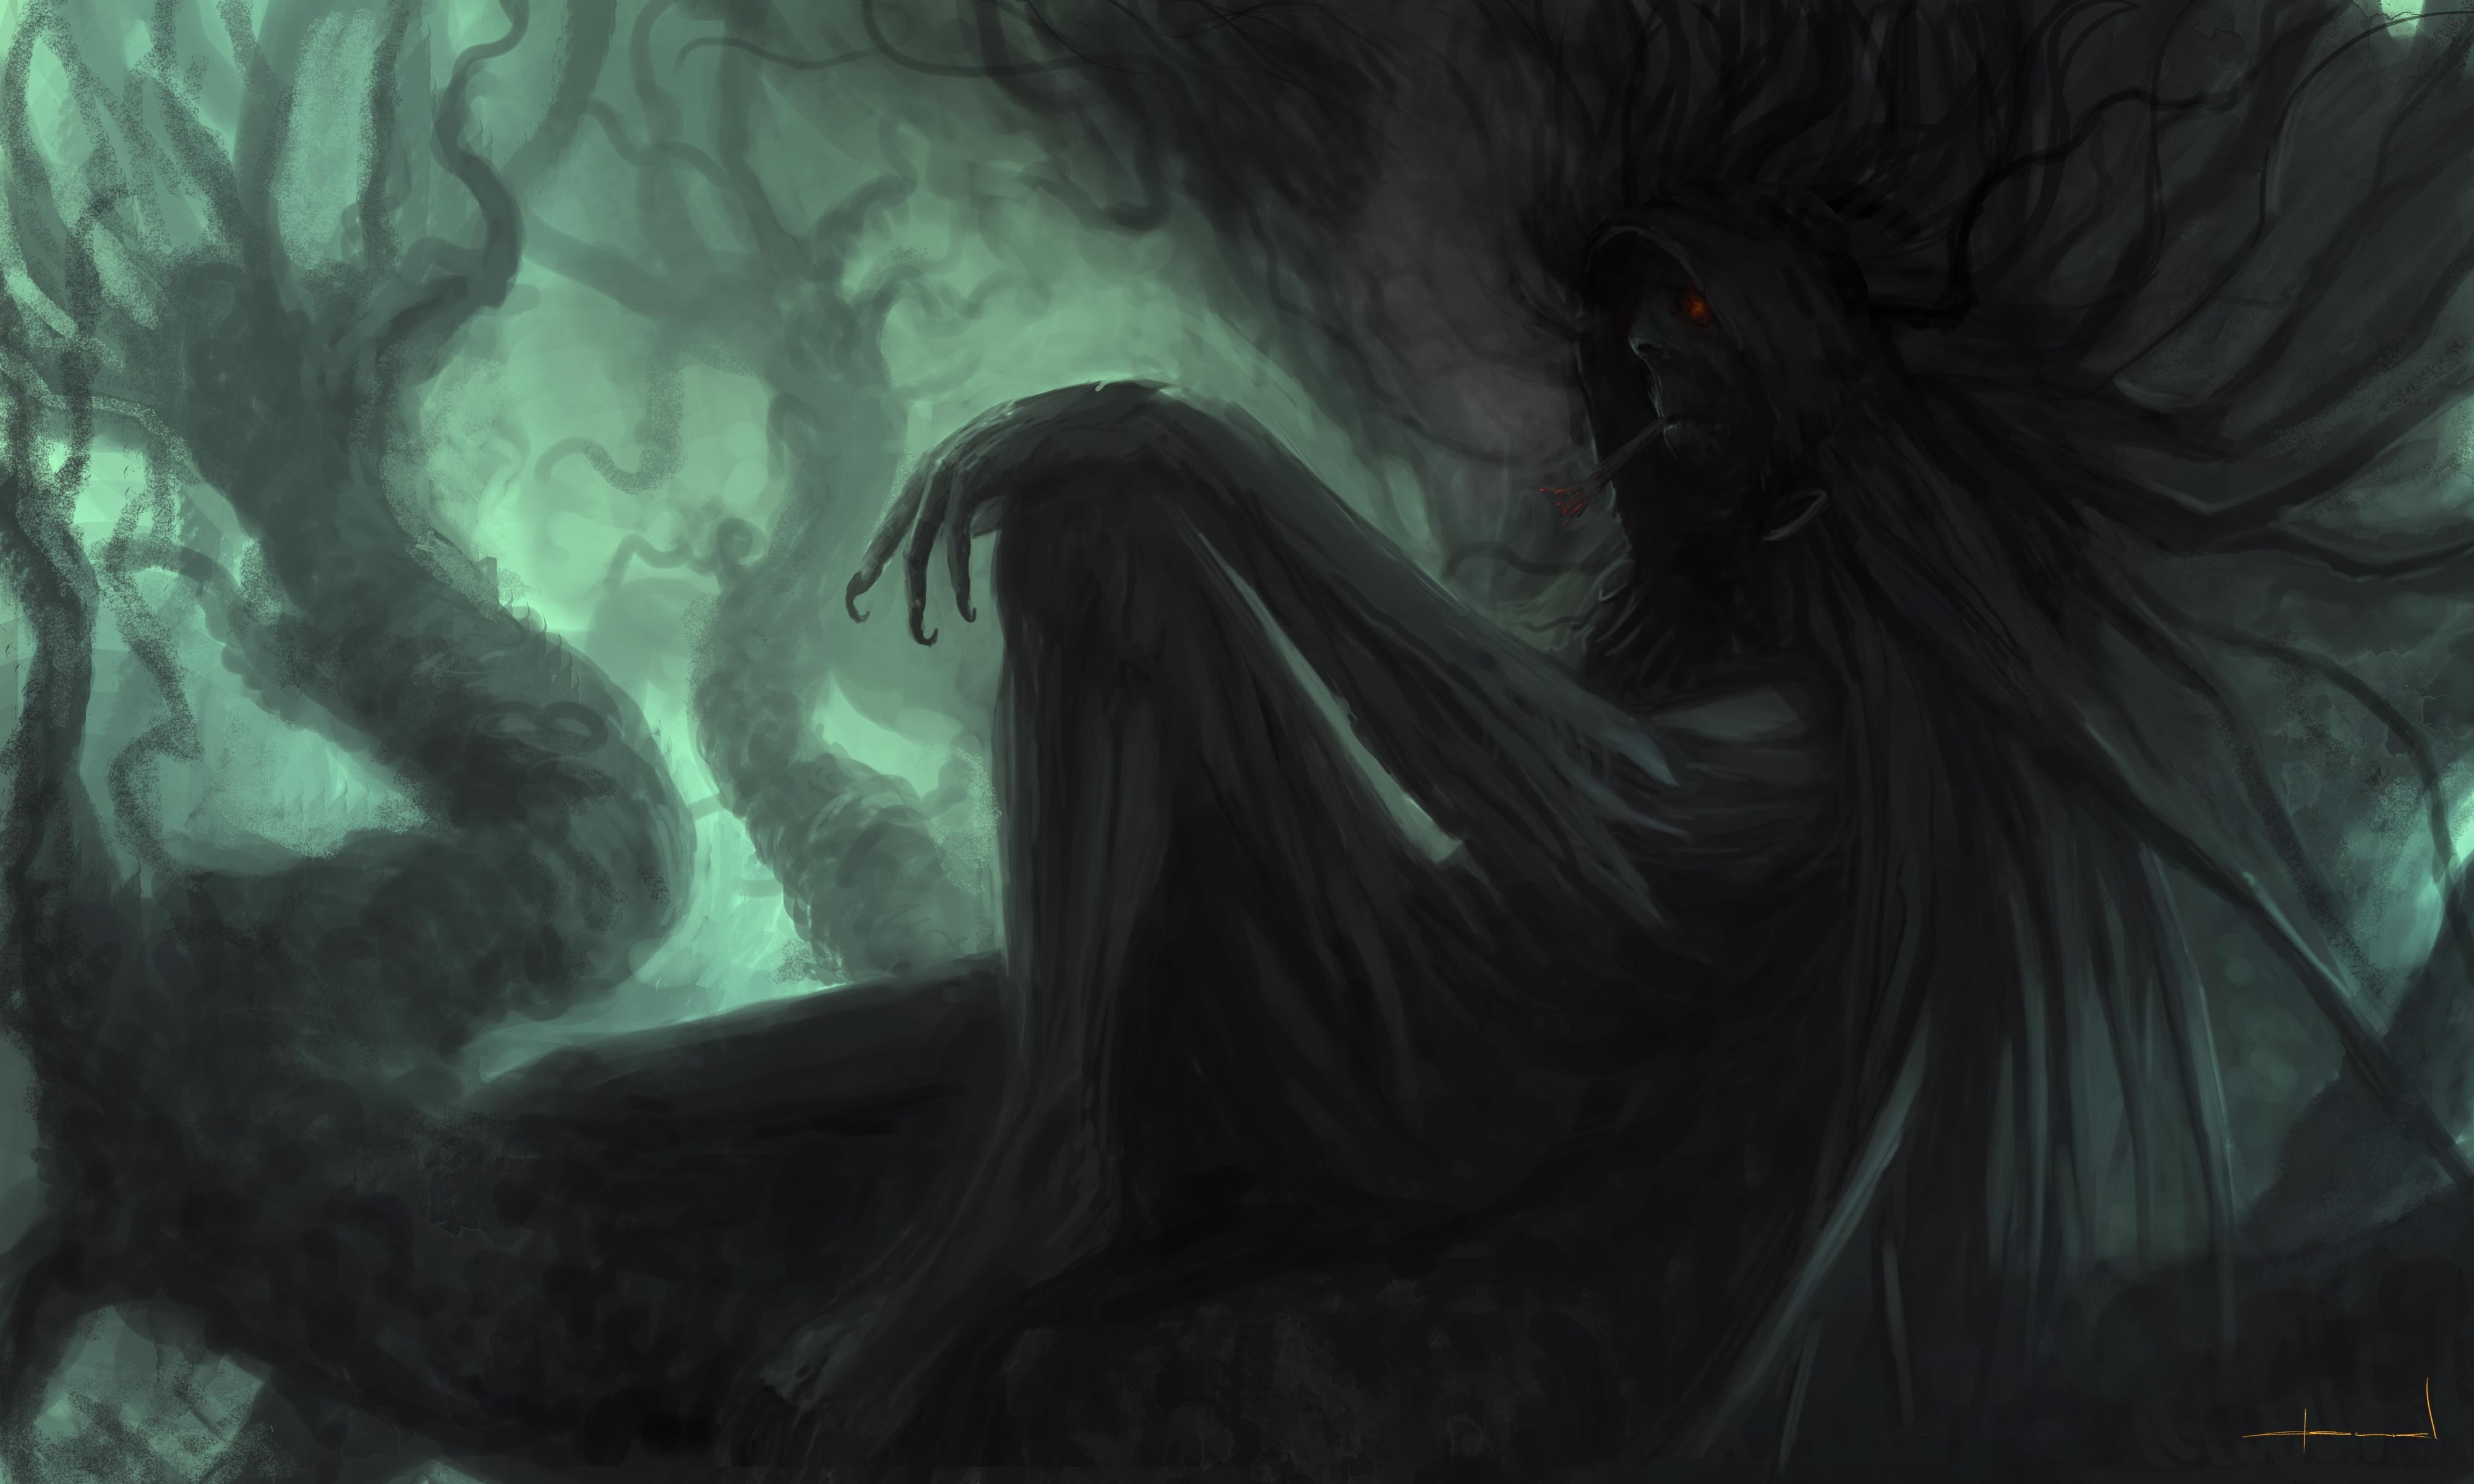 General 4000x2400 fantasy art digital art artwork creature trees branch smoking red eyes creepy rest sitting profile smoke